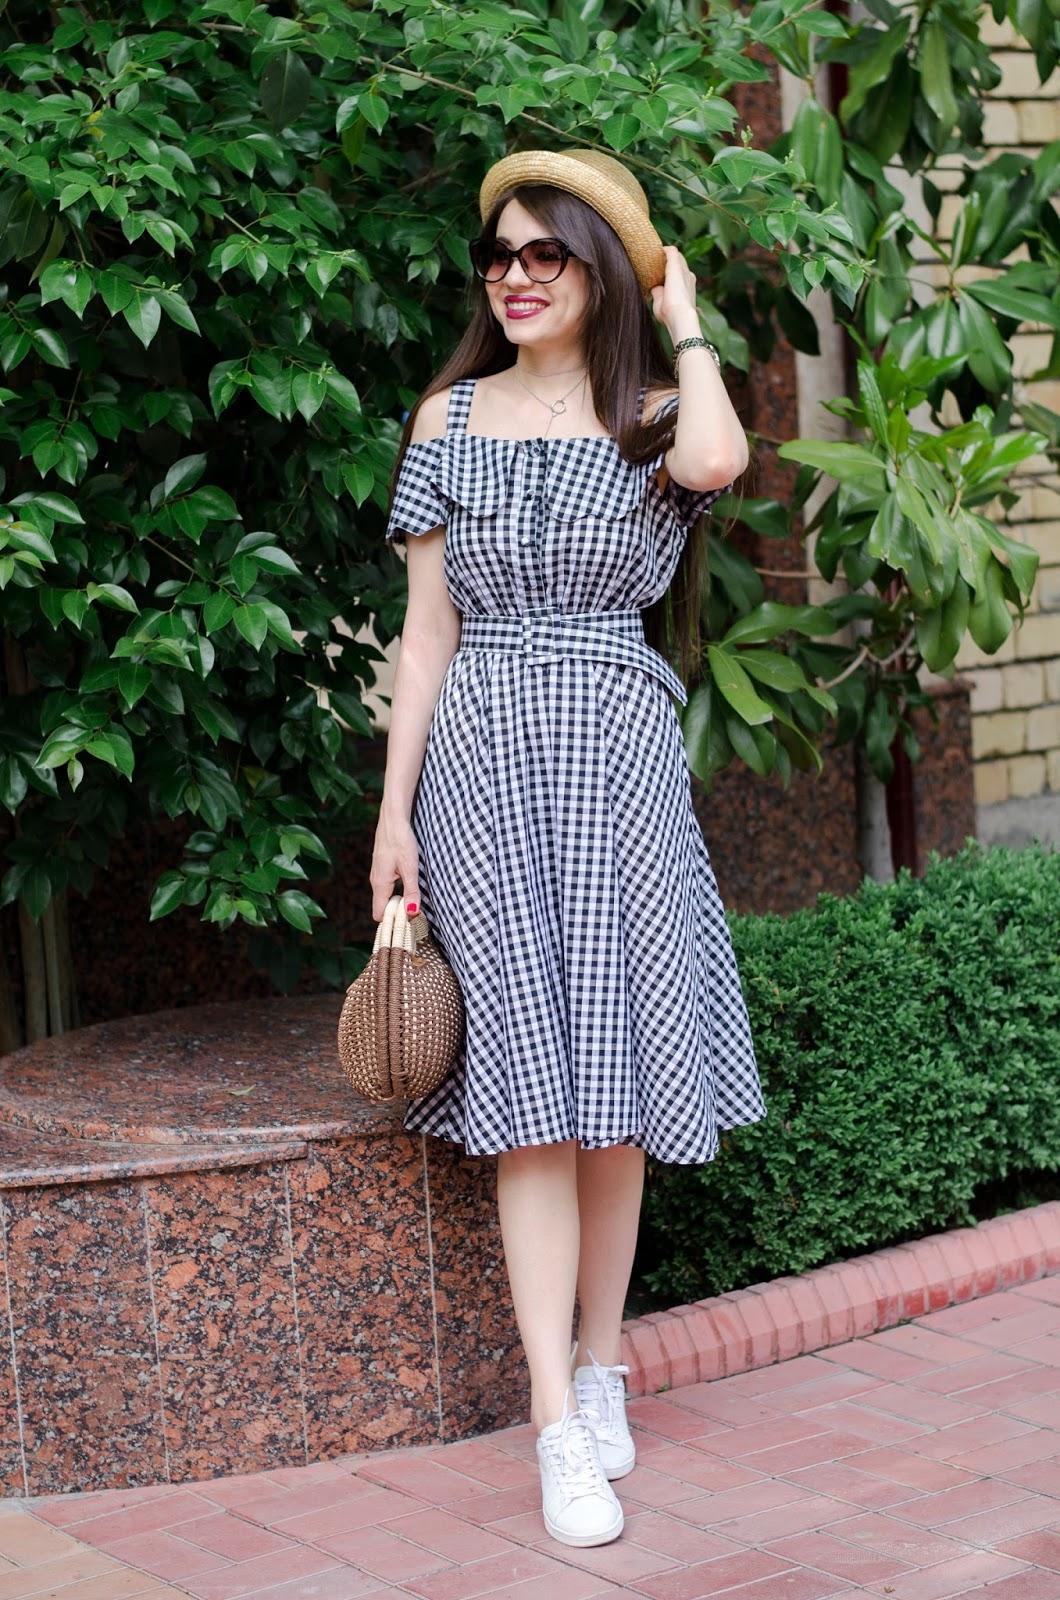 fashion blogger style fashion tashkent diyorasnotes diyora beta lookoftheday white sneakers casual Checkerboard Fold Over Cold Shoulder Dress